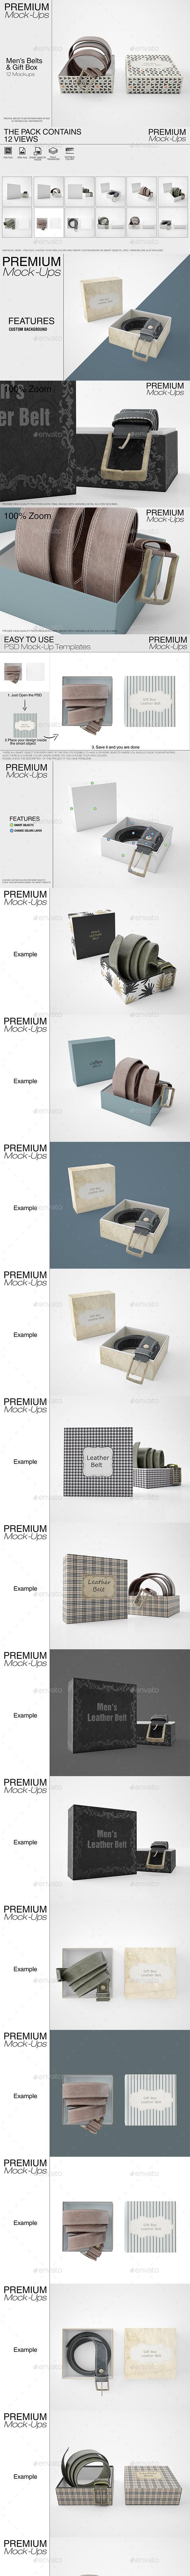 Men's Leather Belt & Gift Box Set - Print Product Mock-Ups